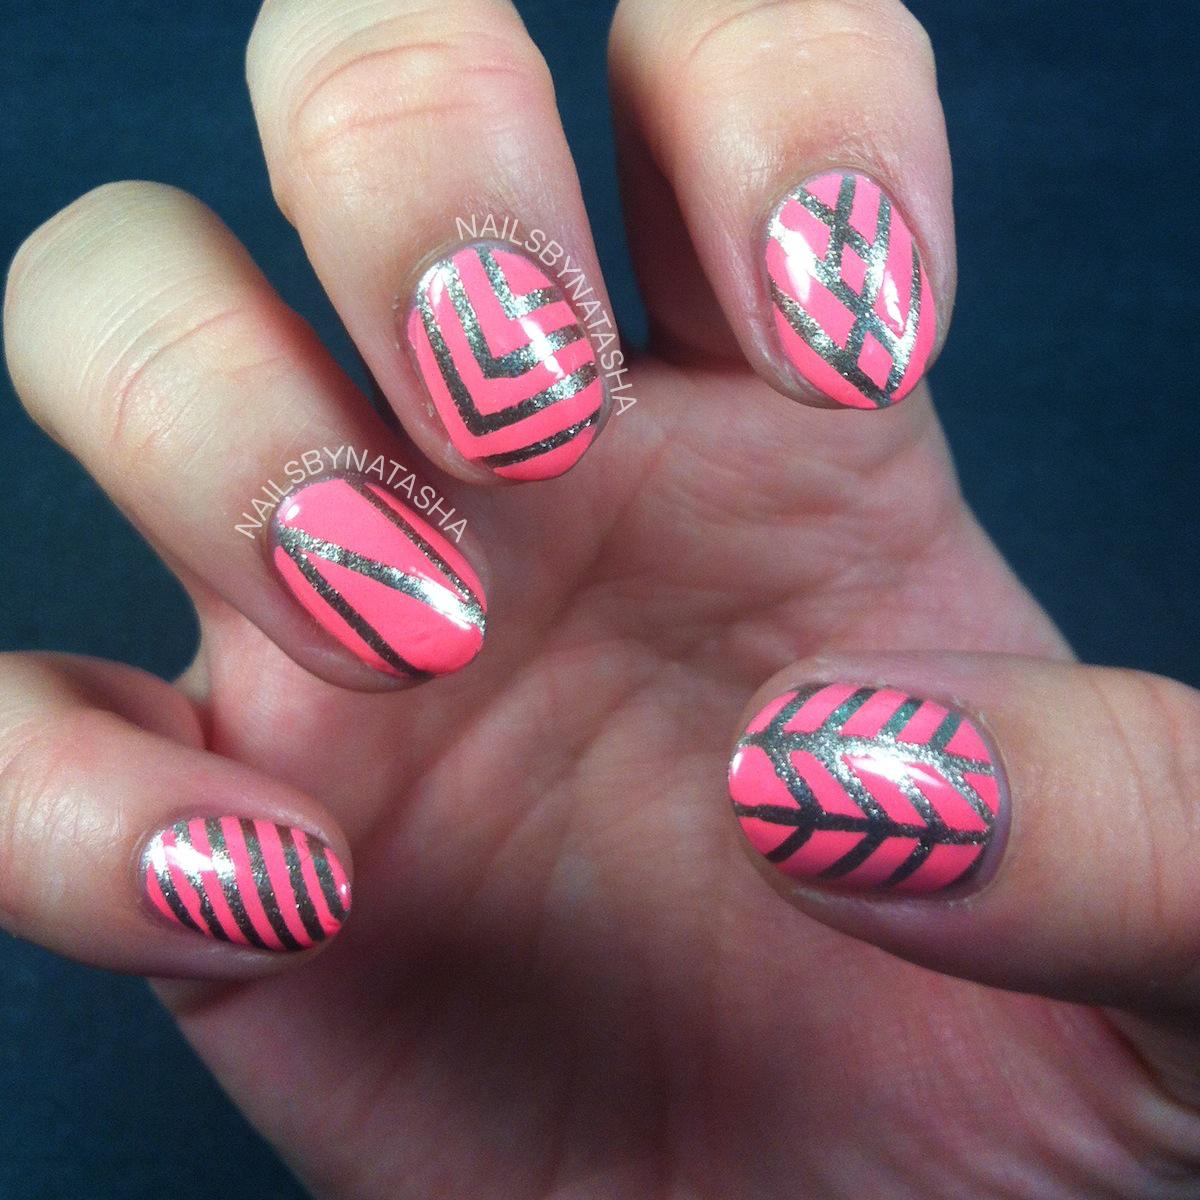 Nails By Natasha: First Striping Tape Designs